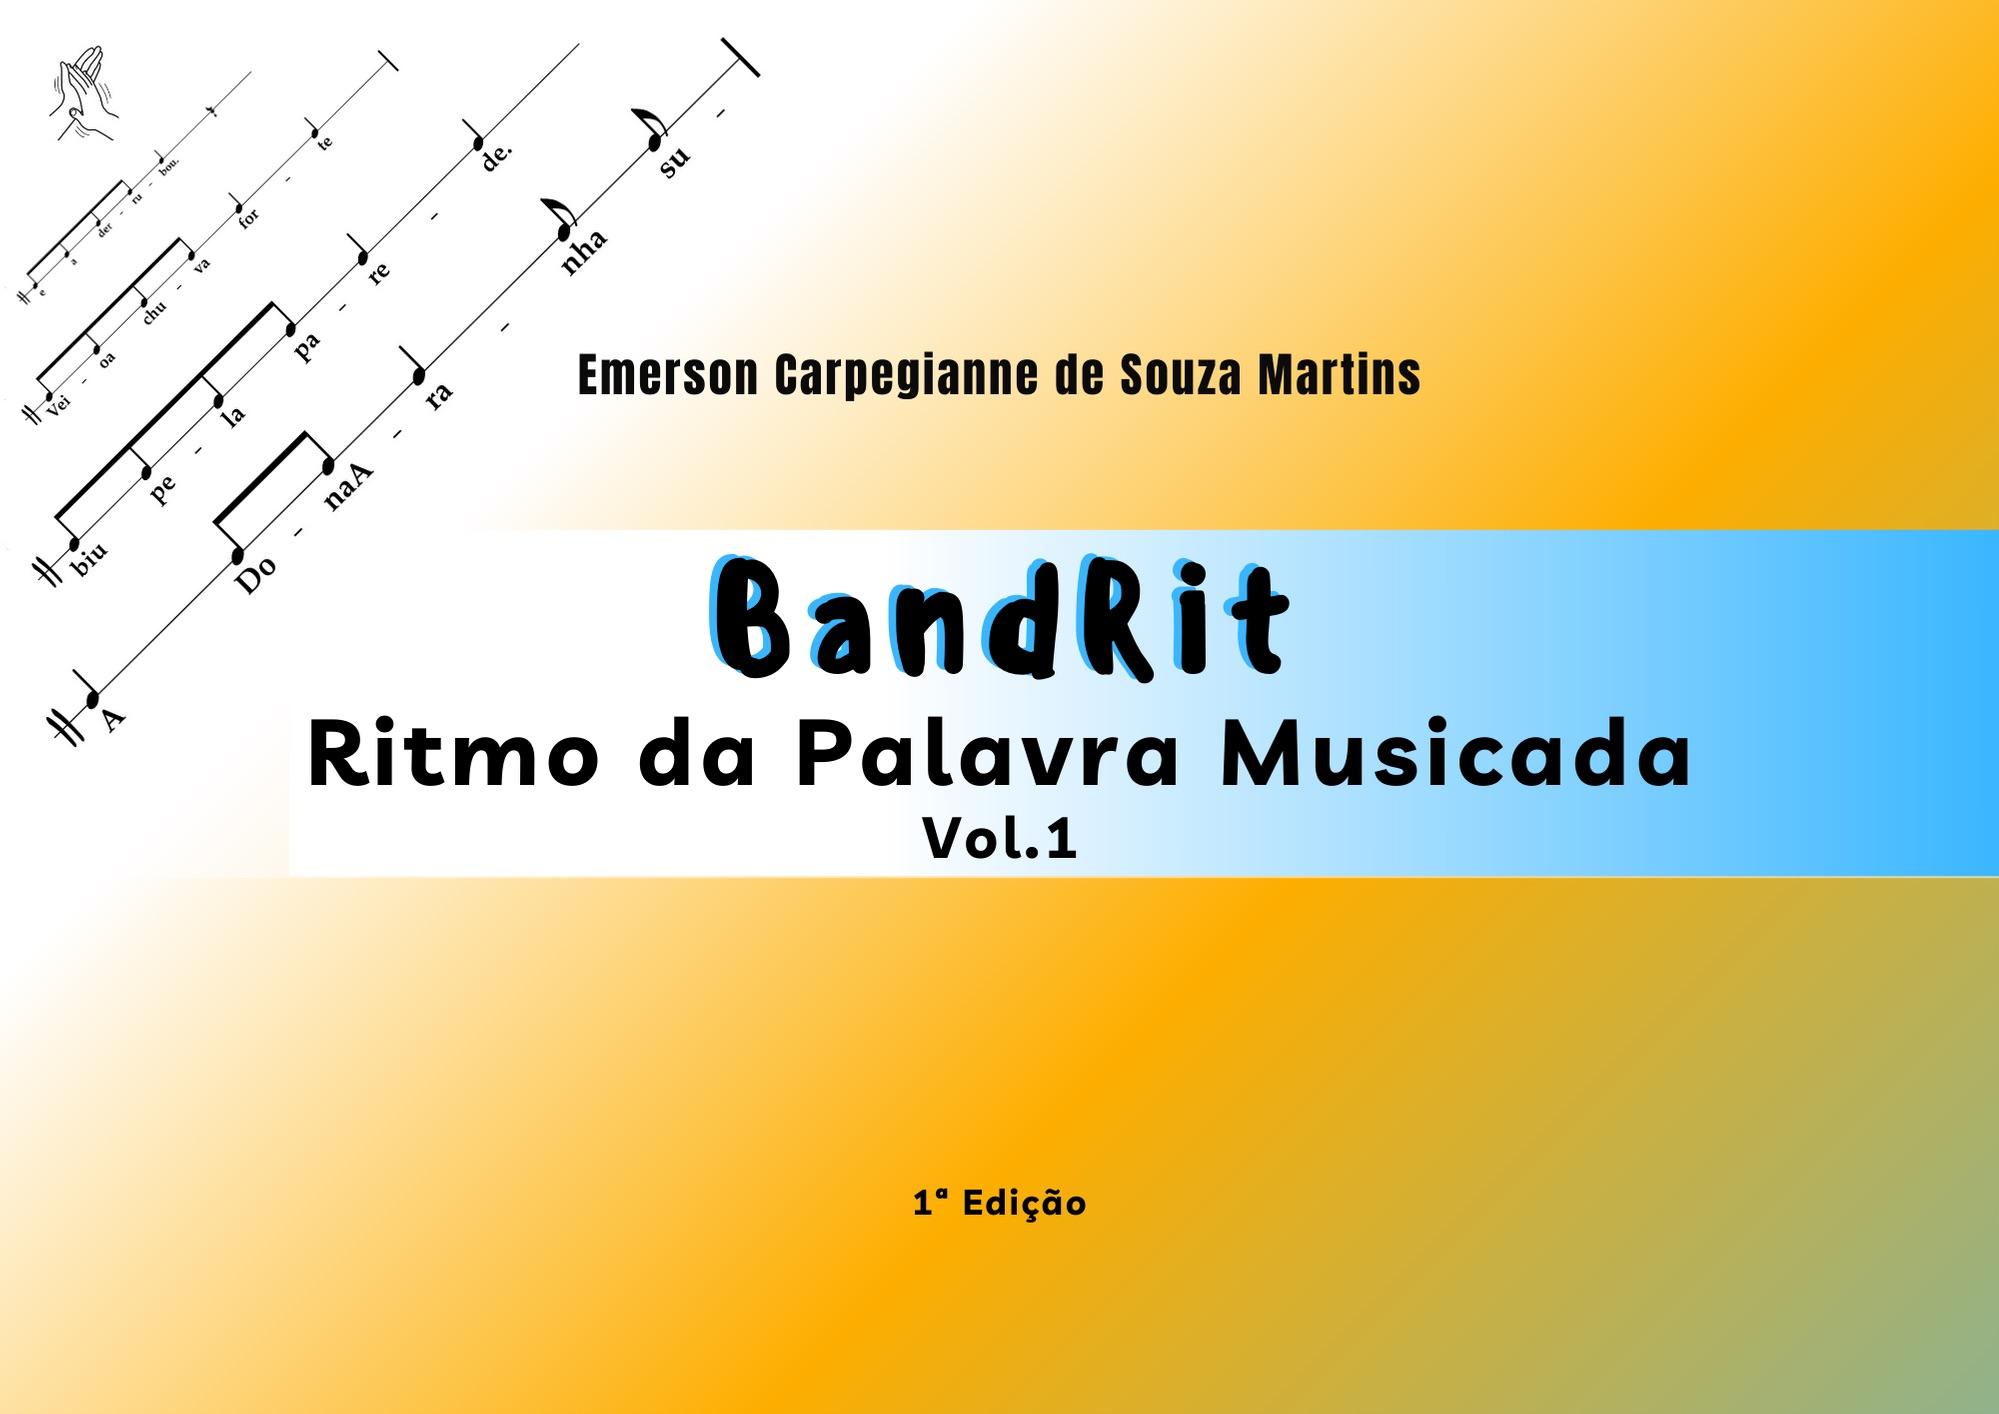 BandRit- ritmo da palavra musicada livro ebook